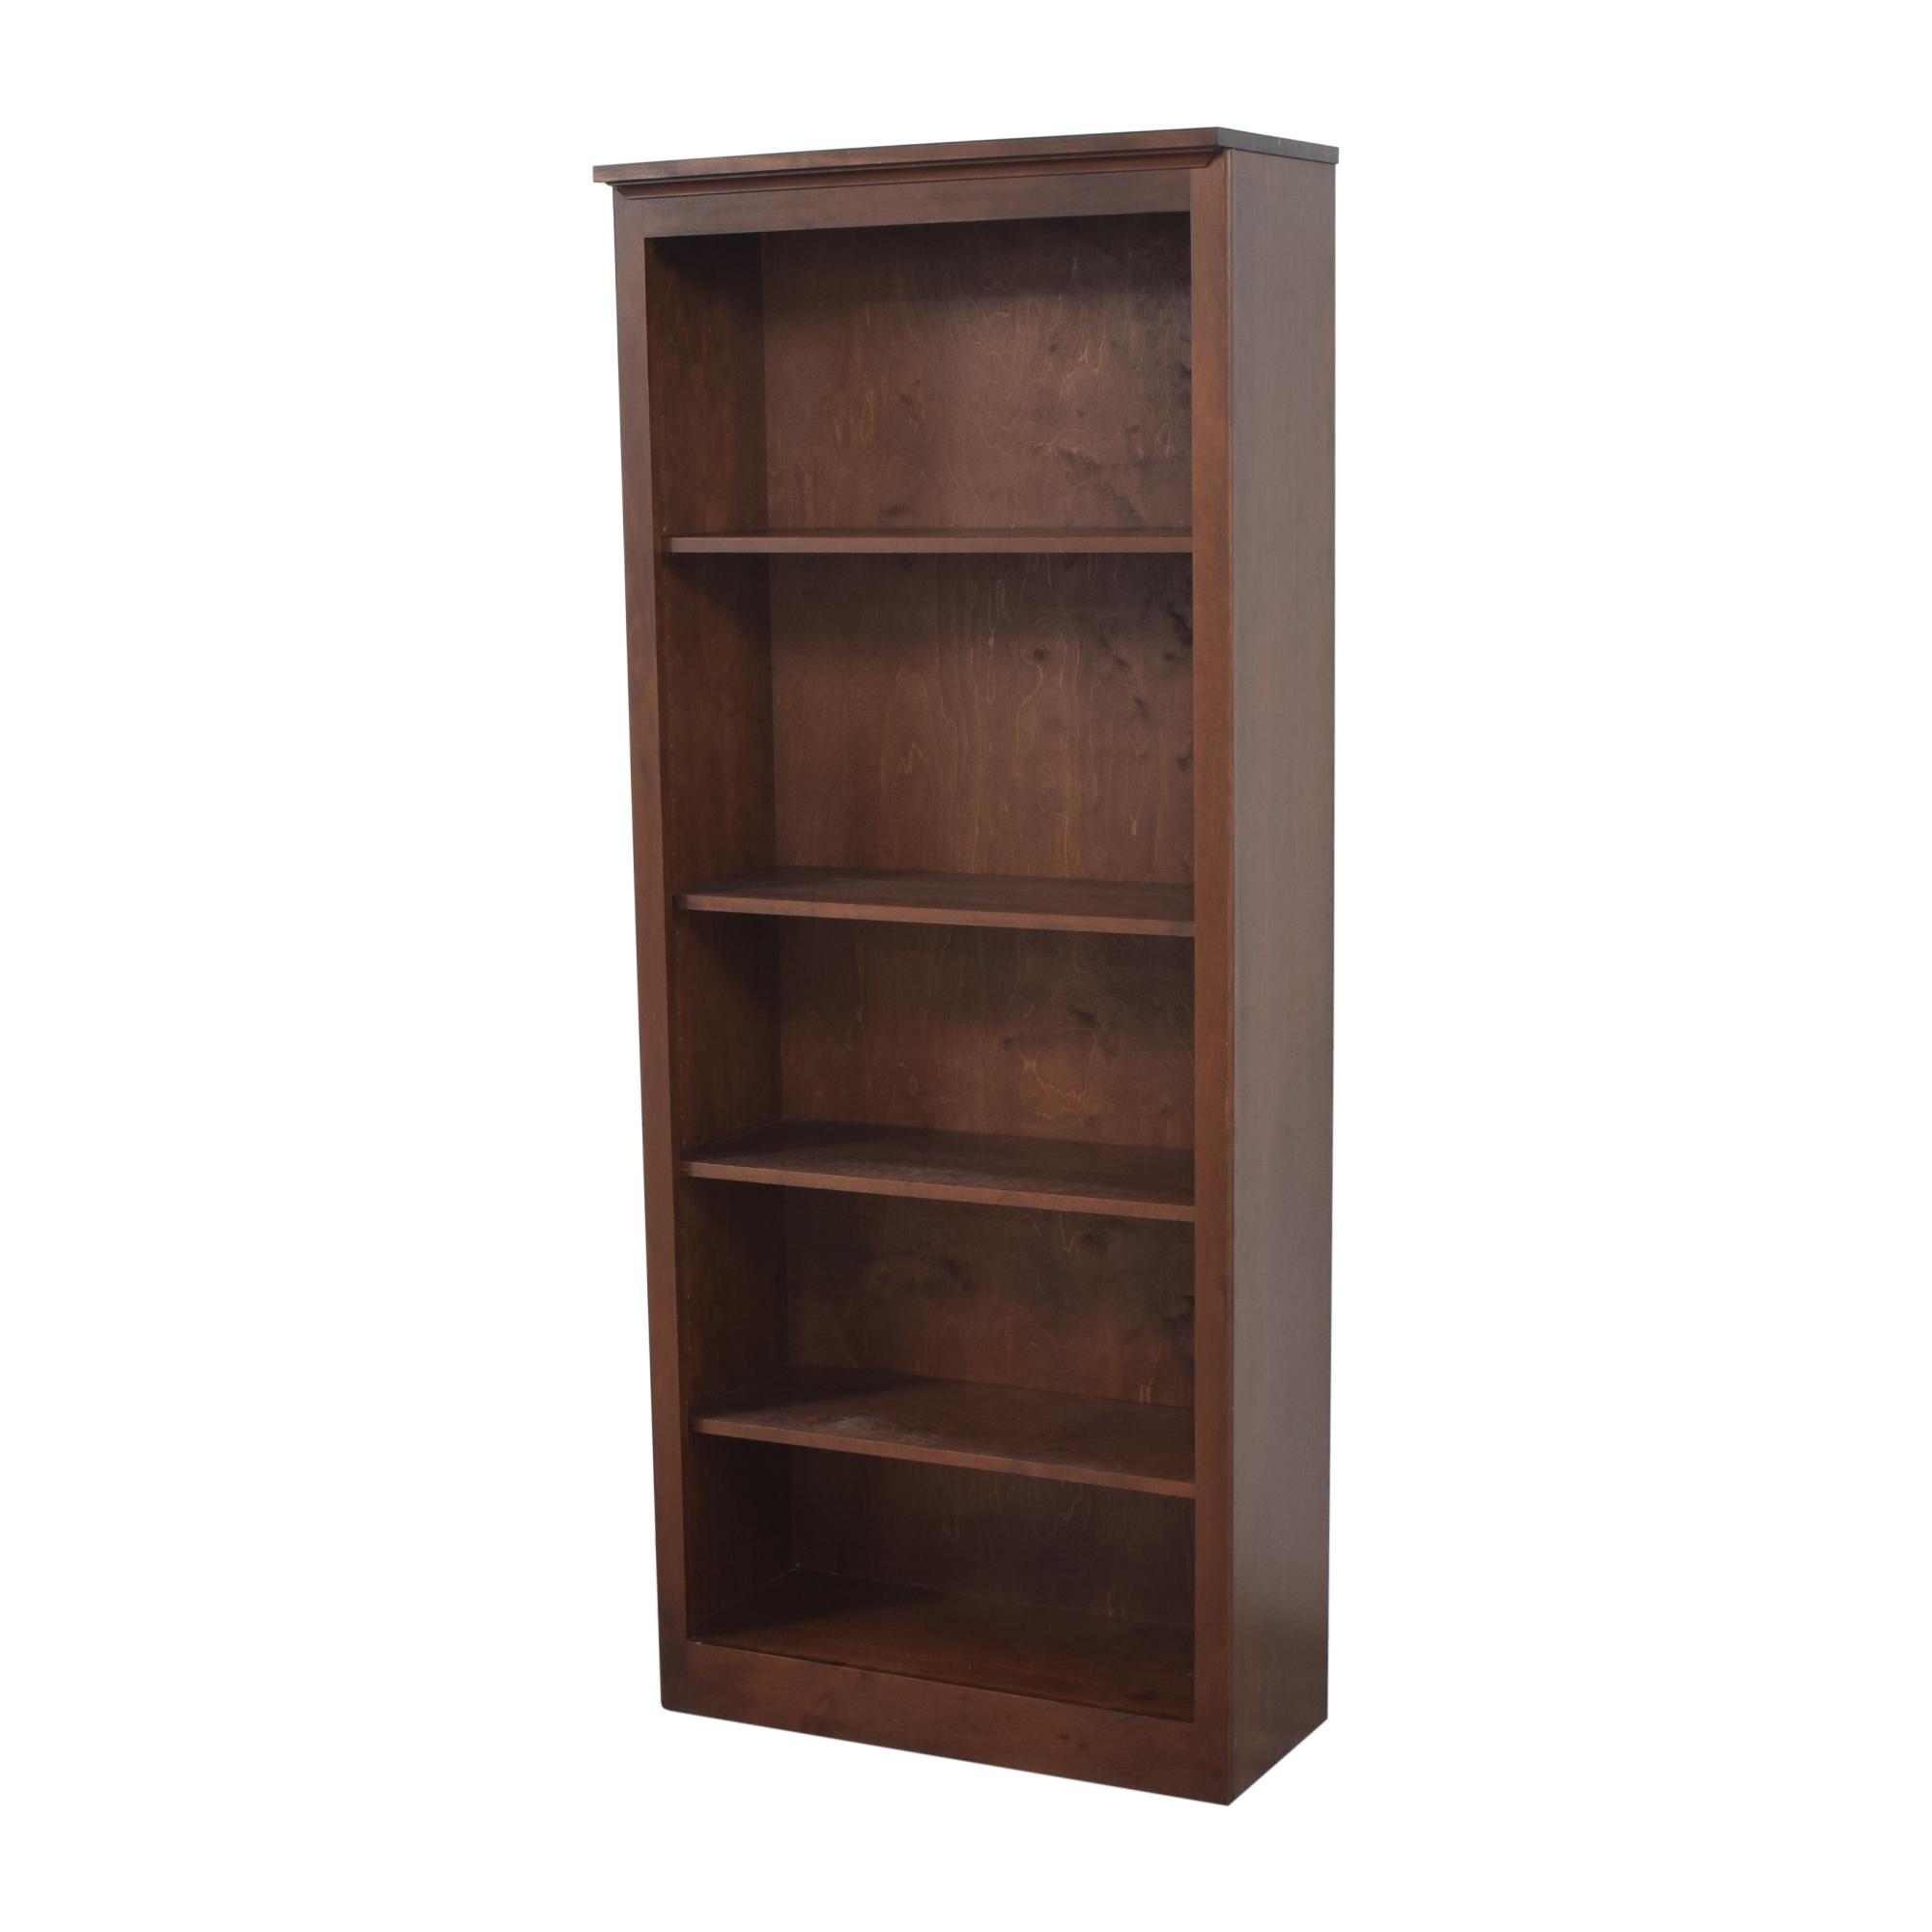 Crate & Barrel Crate & Barrel Tall Bookcase brown